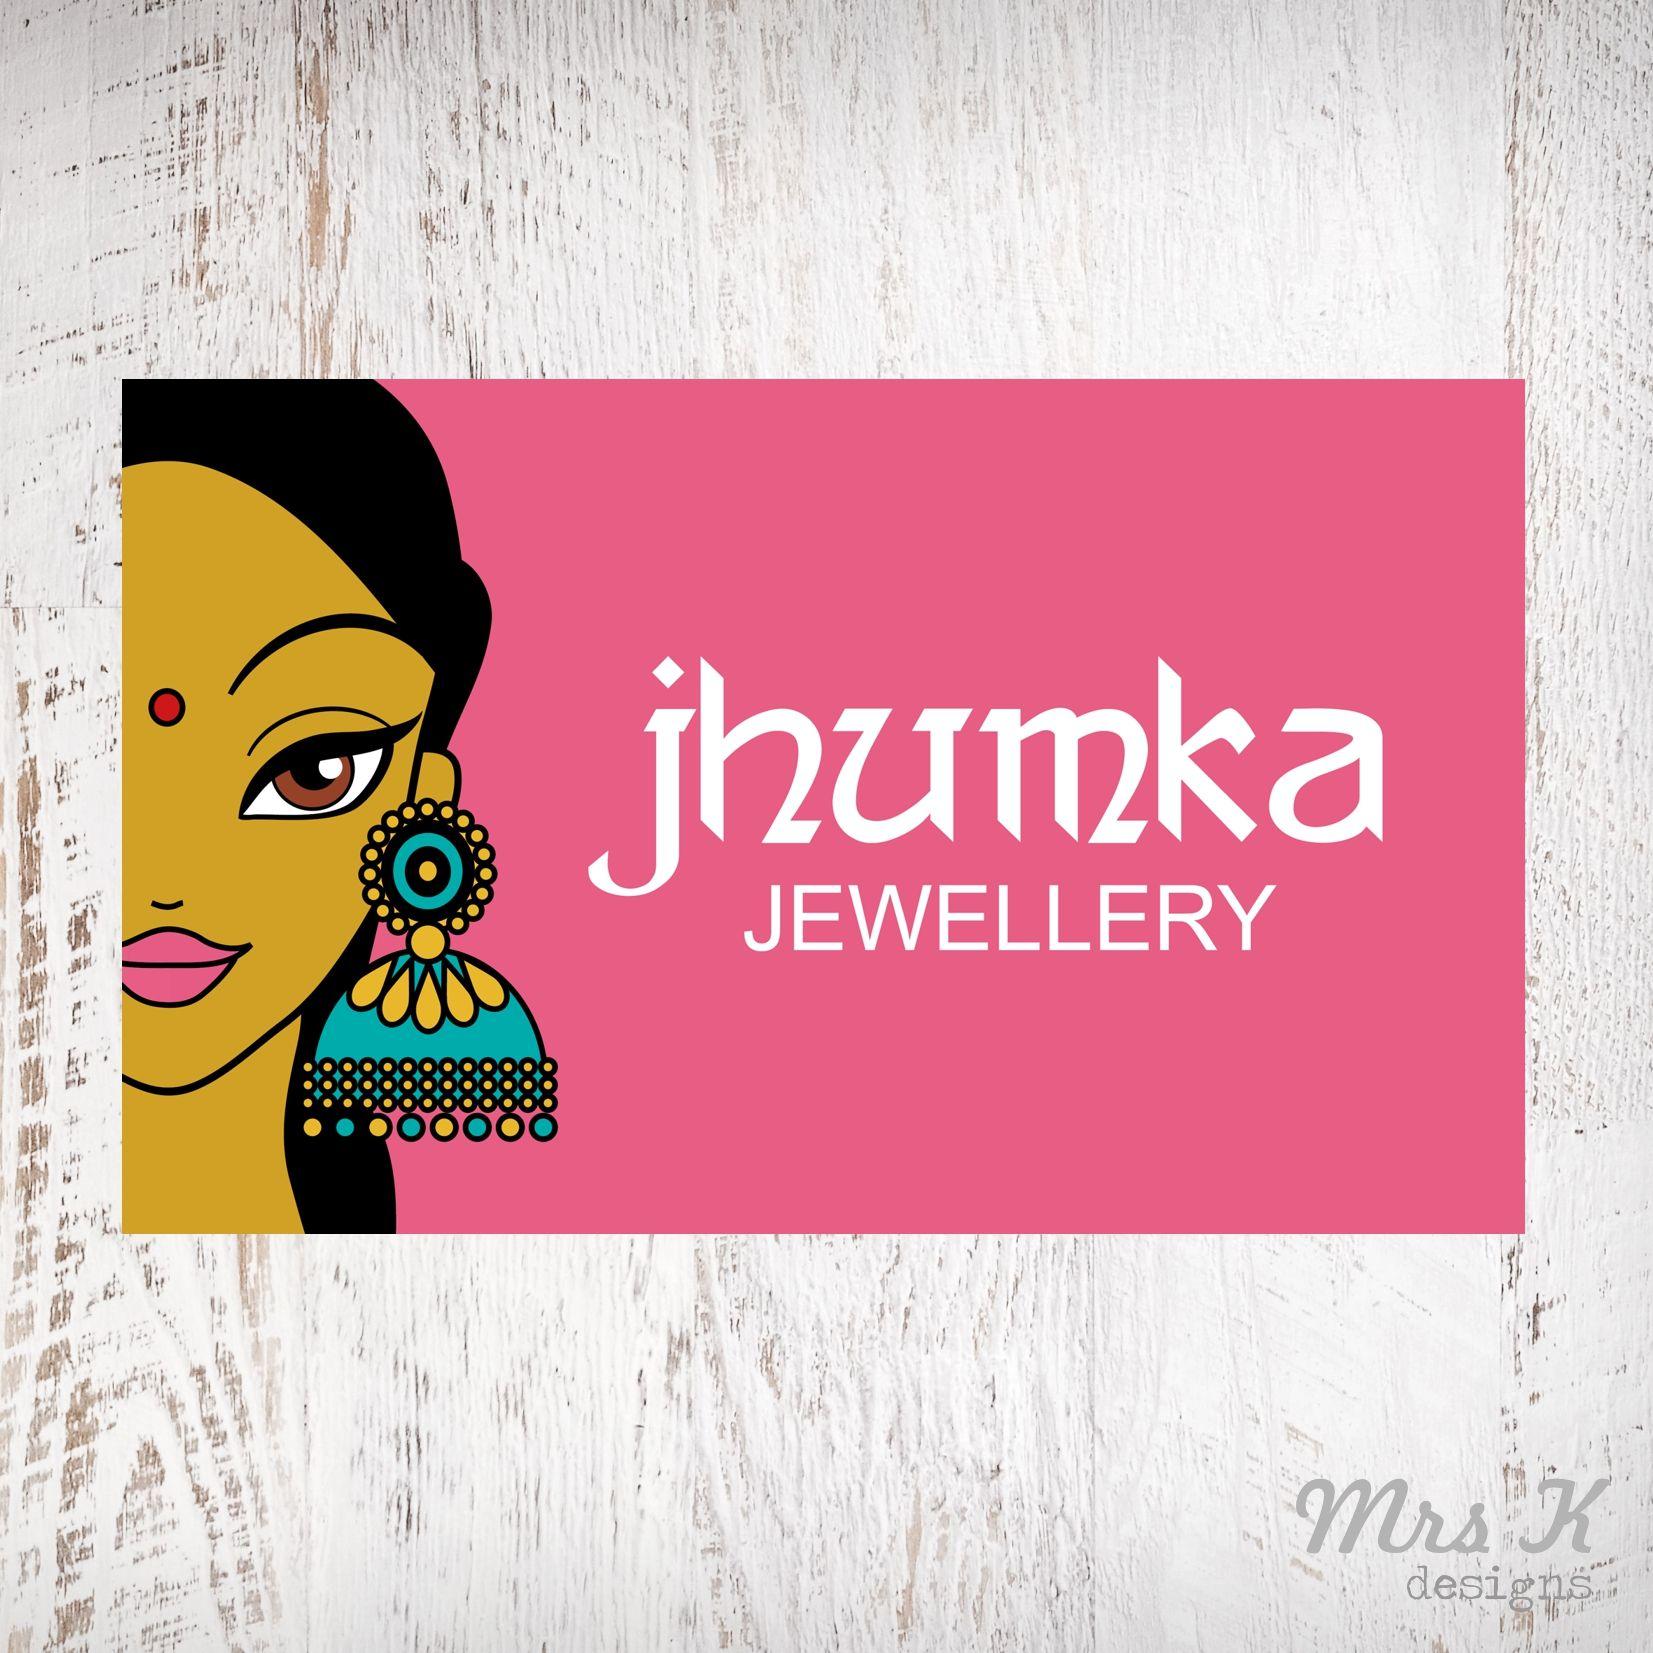 Logos - Jhumka Jewellery2